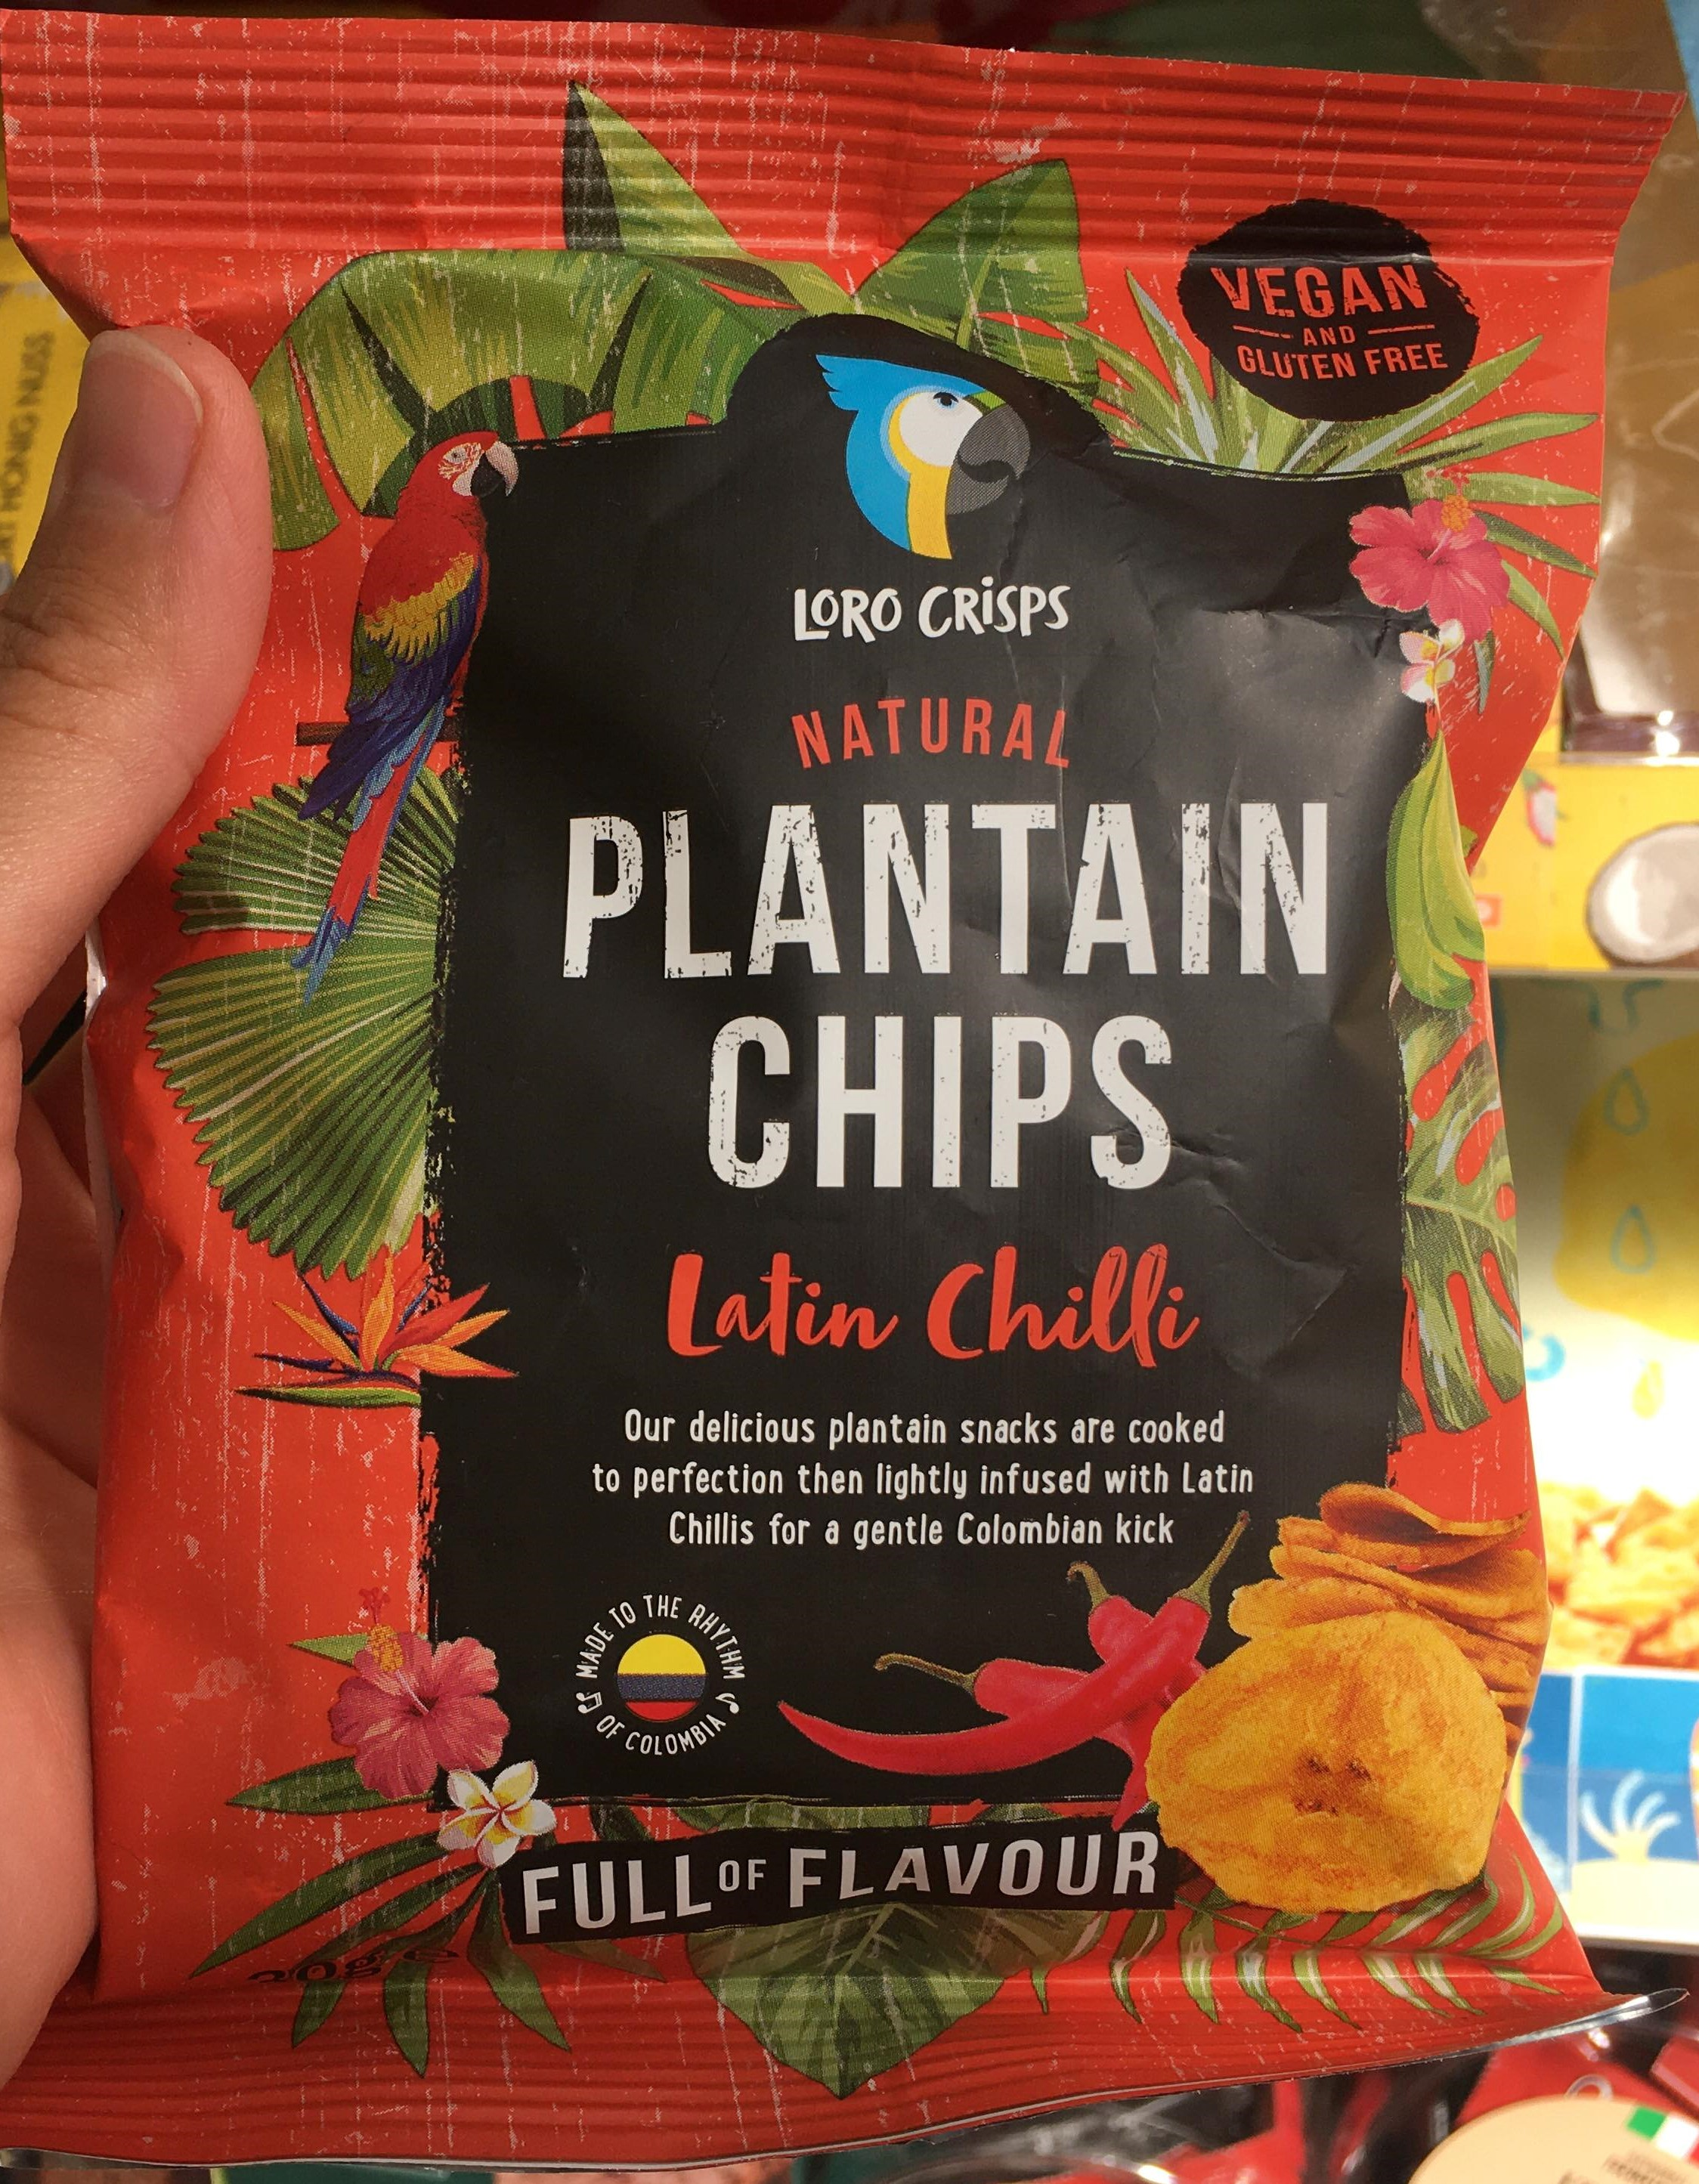 Loro Crisps Natural Plantain Chips Latin Chilli